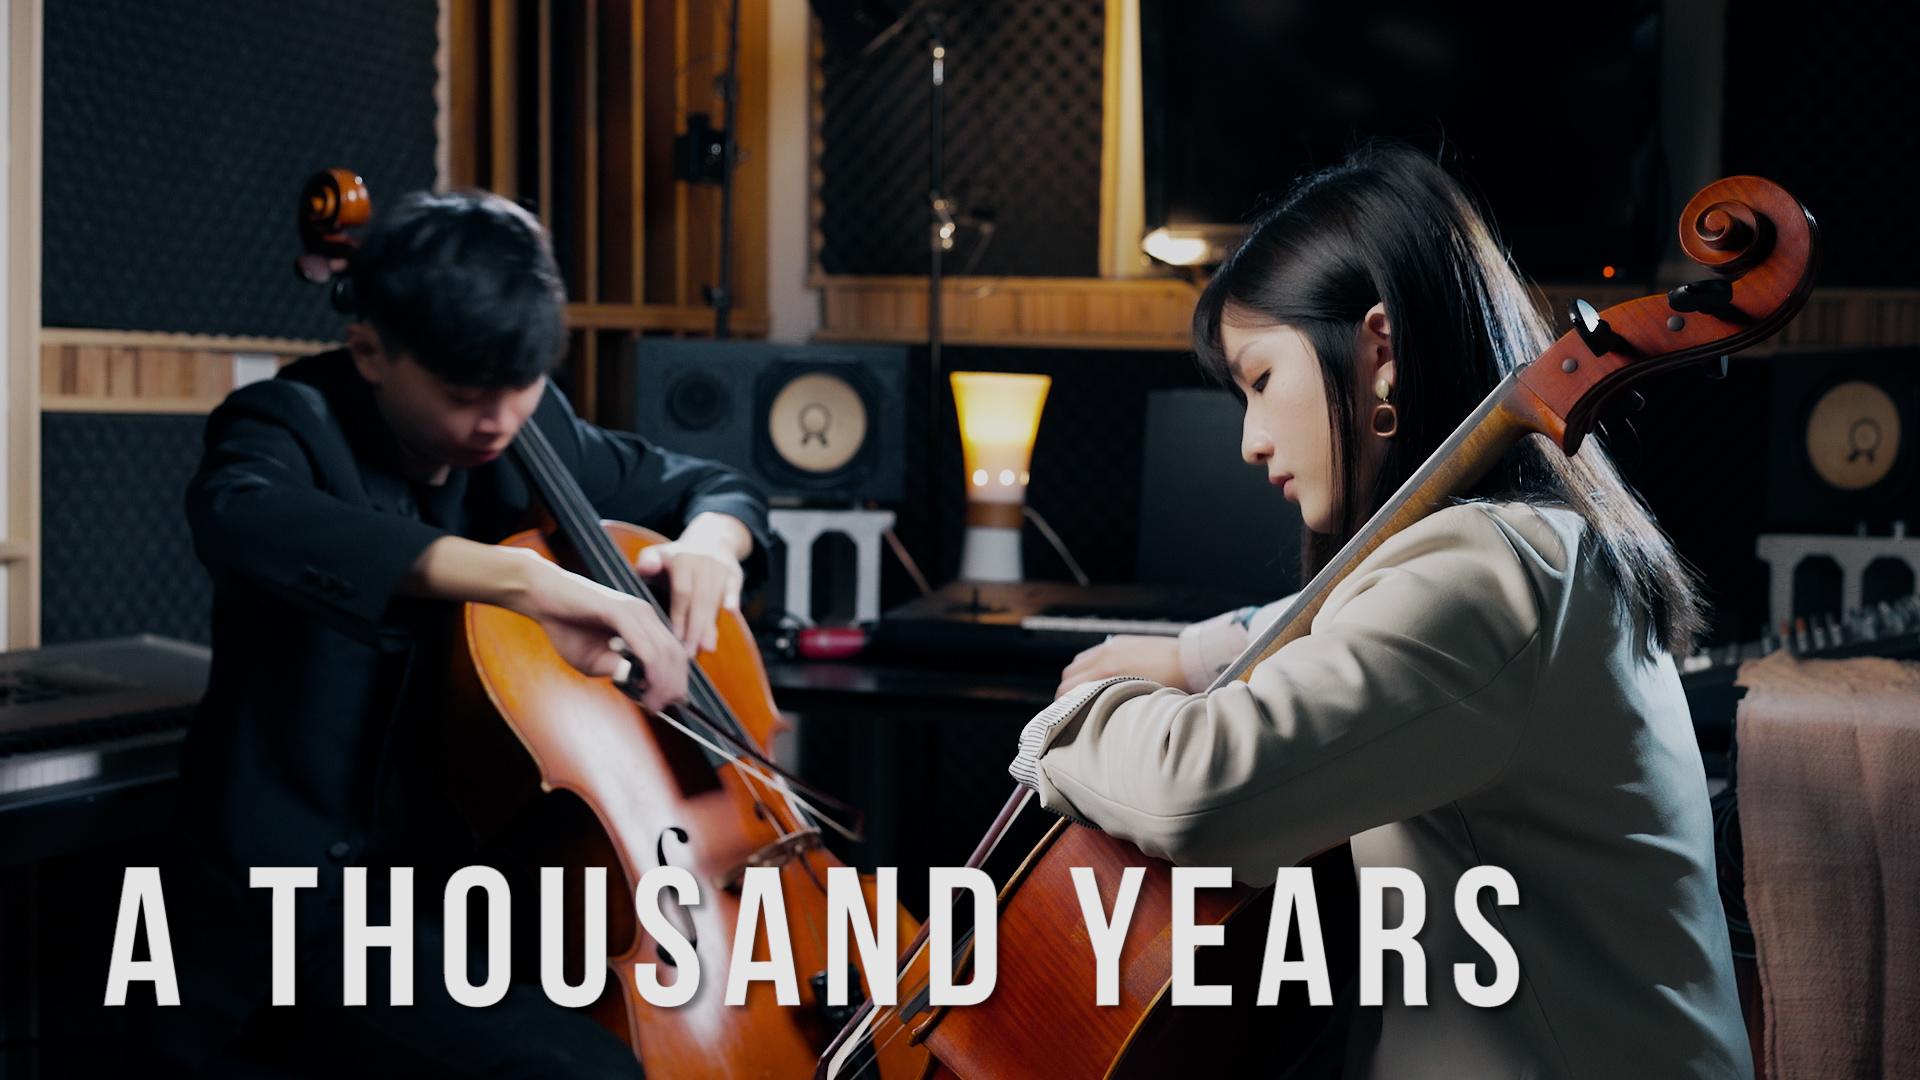 《A Thousand Years》- Christina Perri - Cello Duet 大提琴二重奏『Cover by YoYo Cello』 ft.蔡馥伃Fuyu